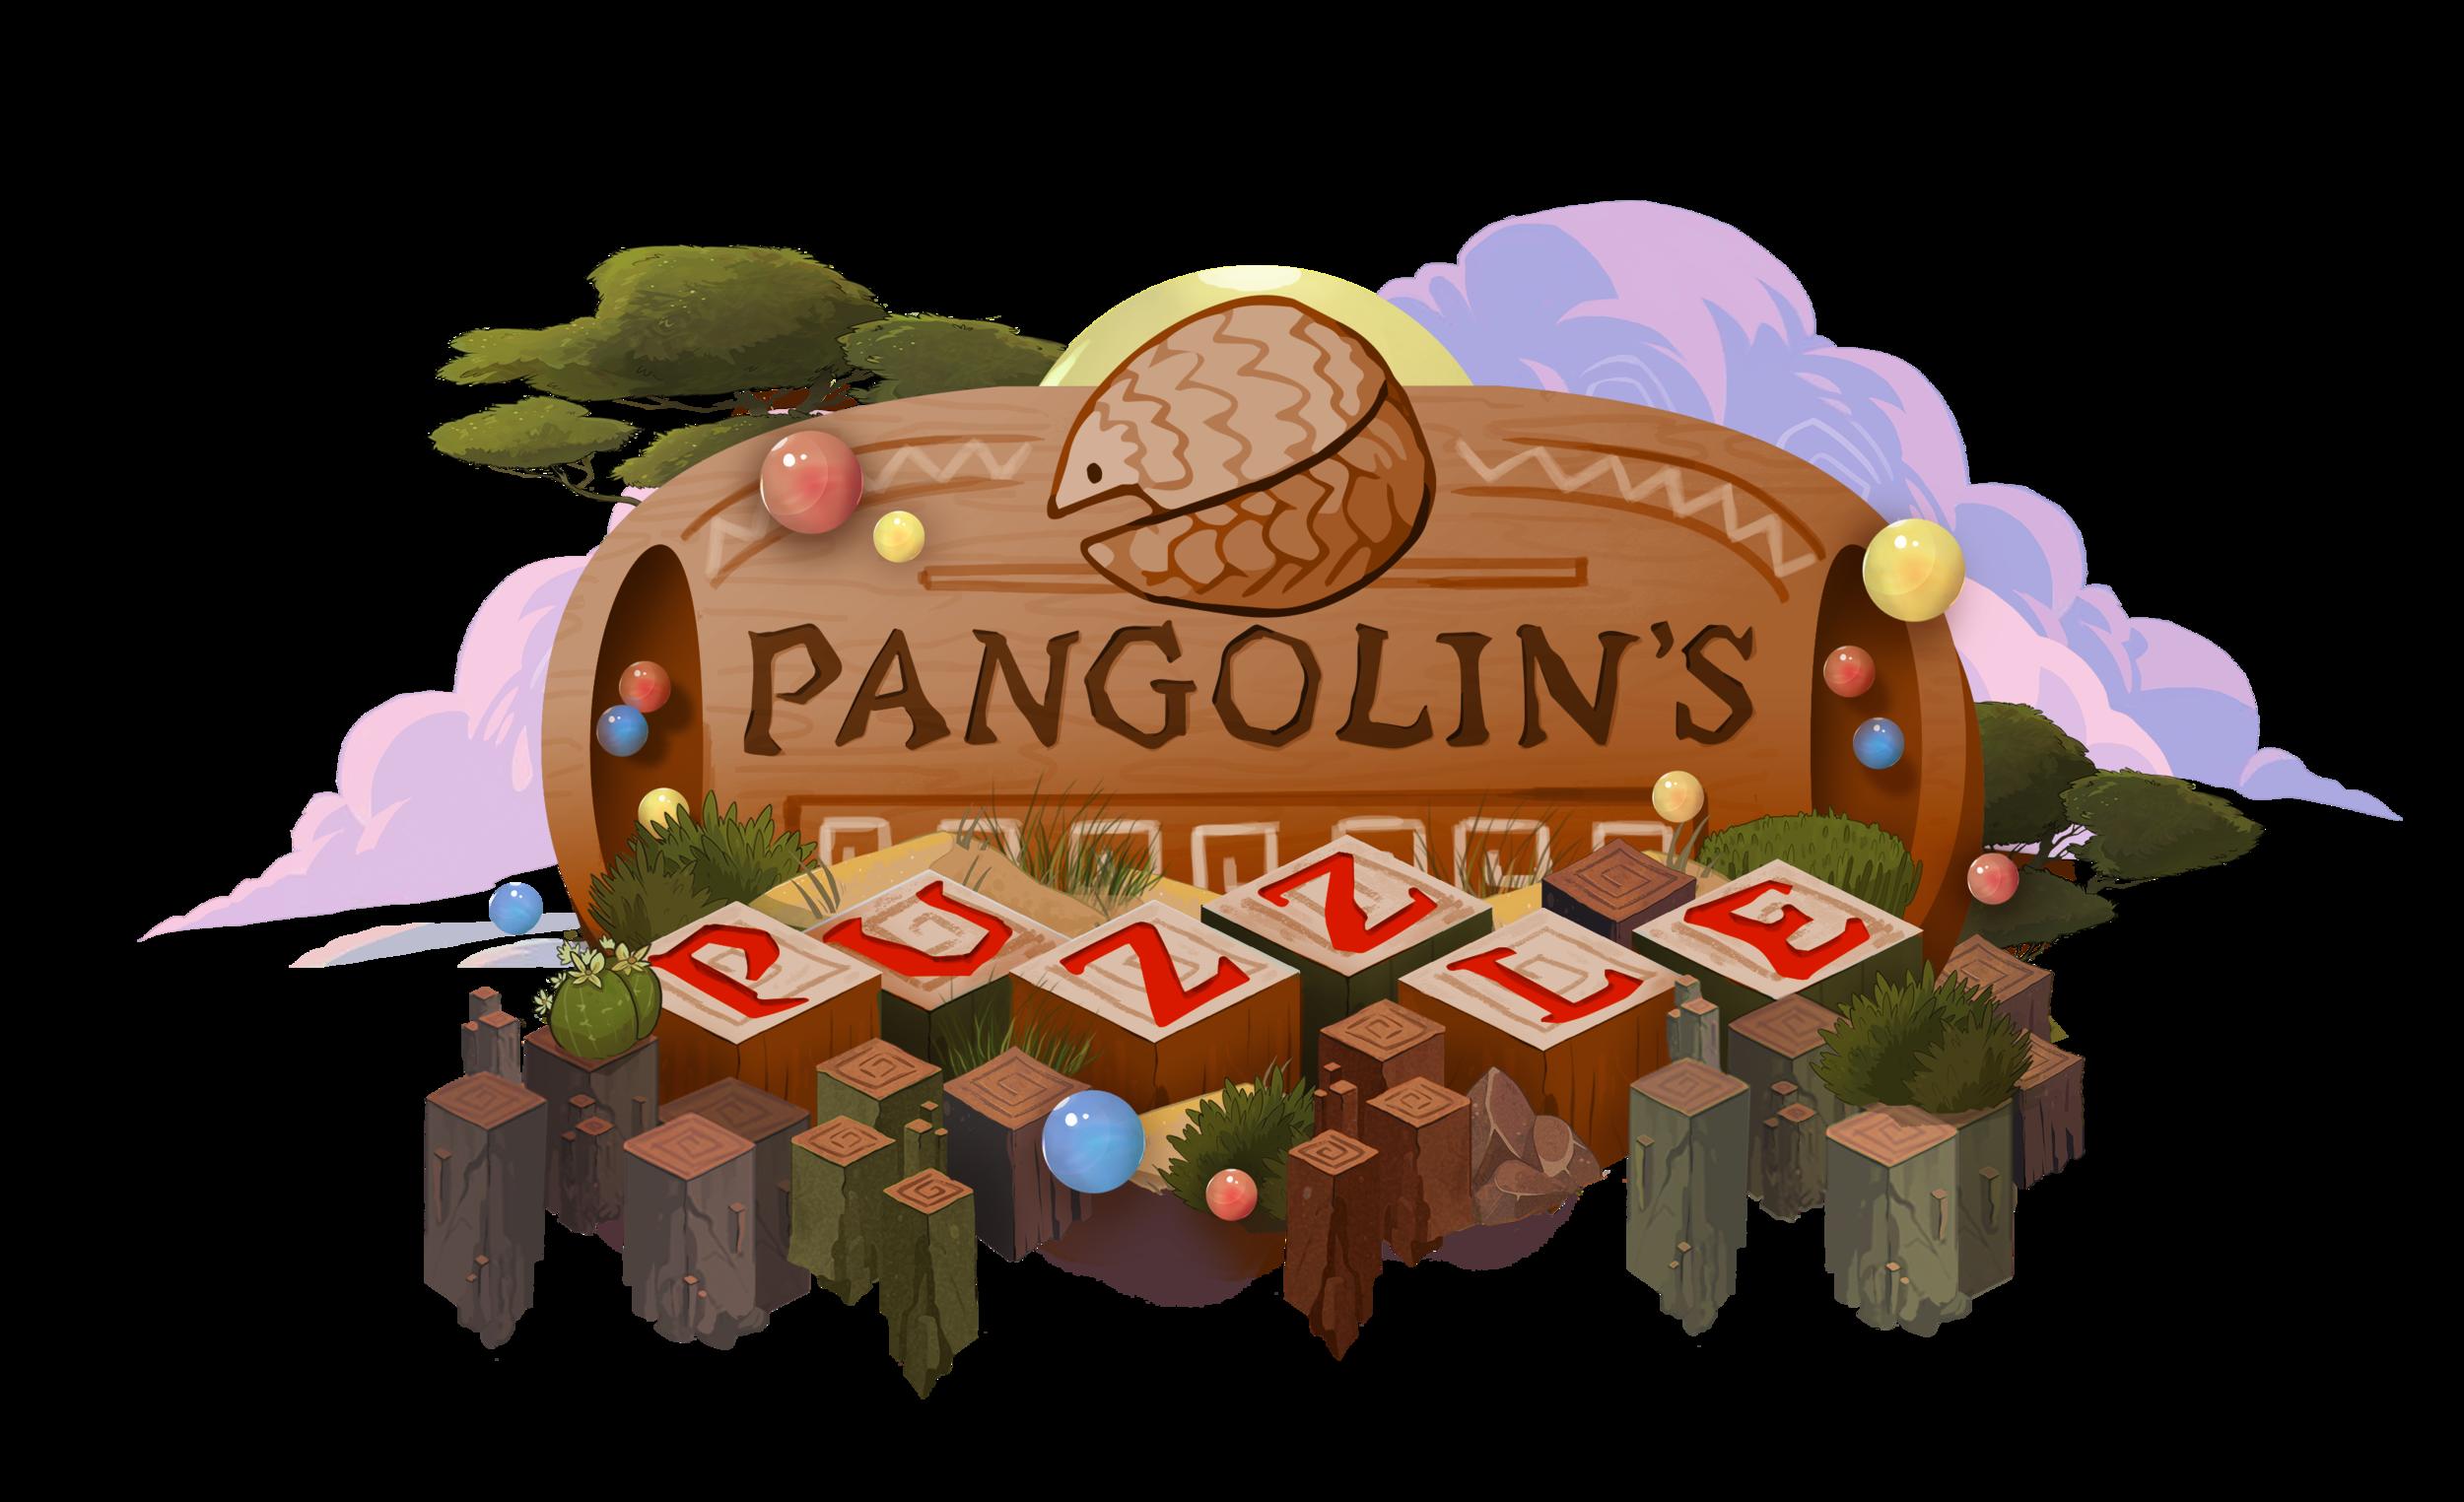 PangolinsPuzzleLogo